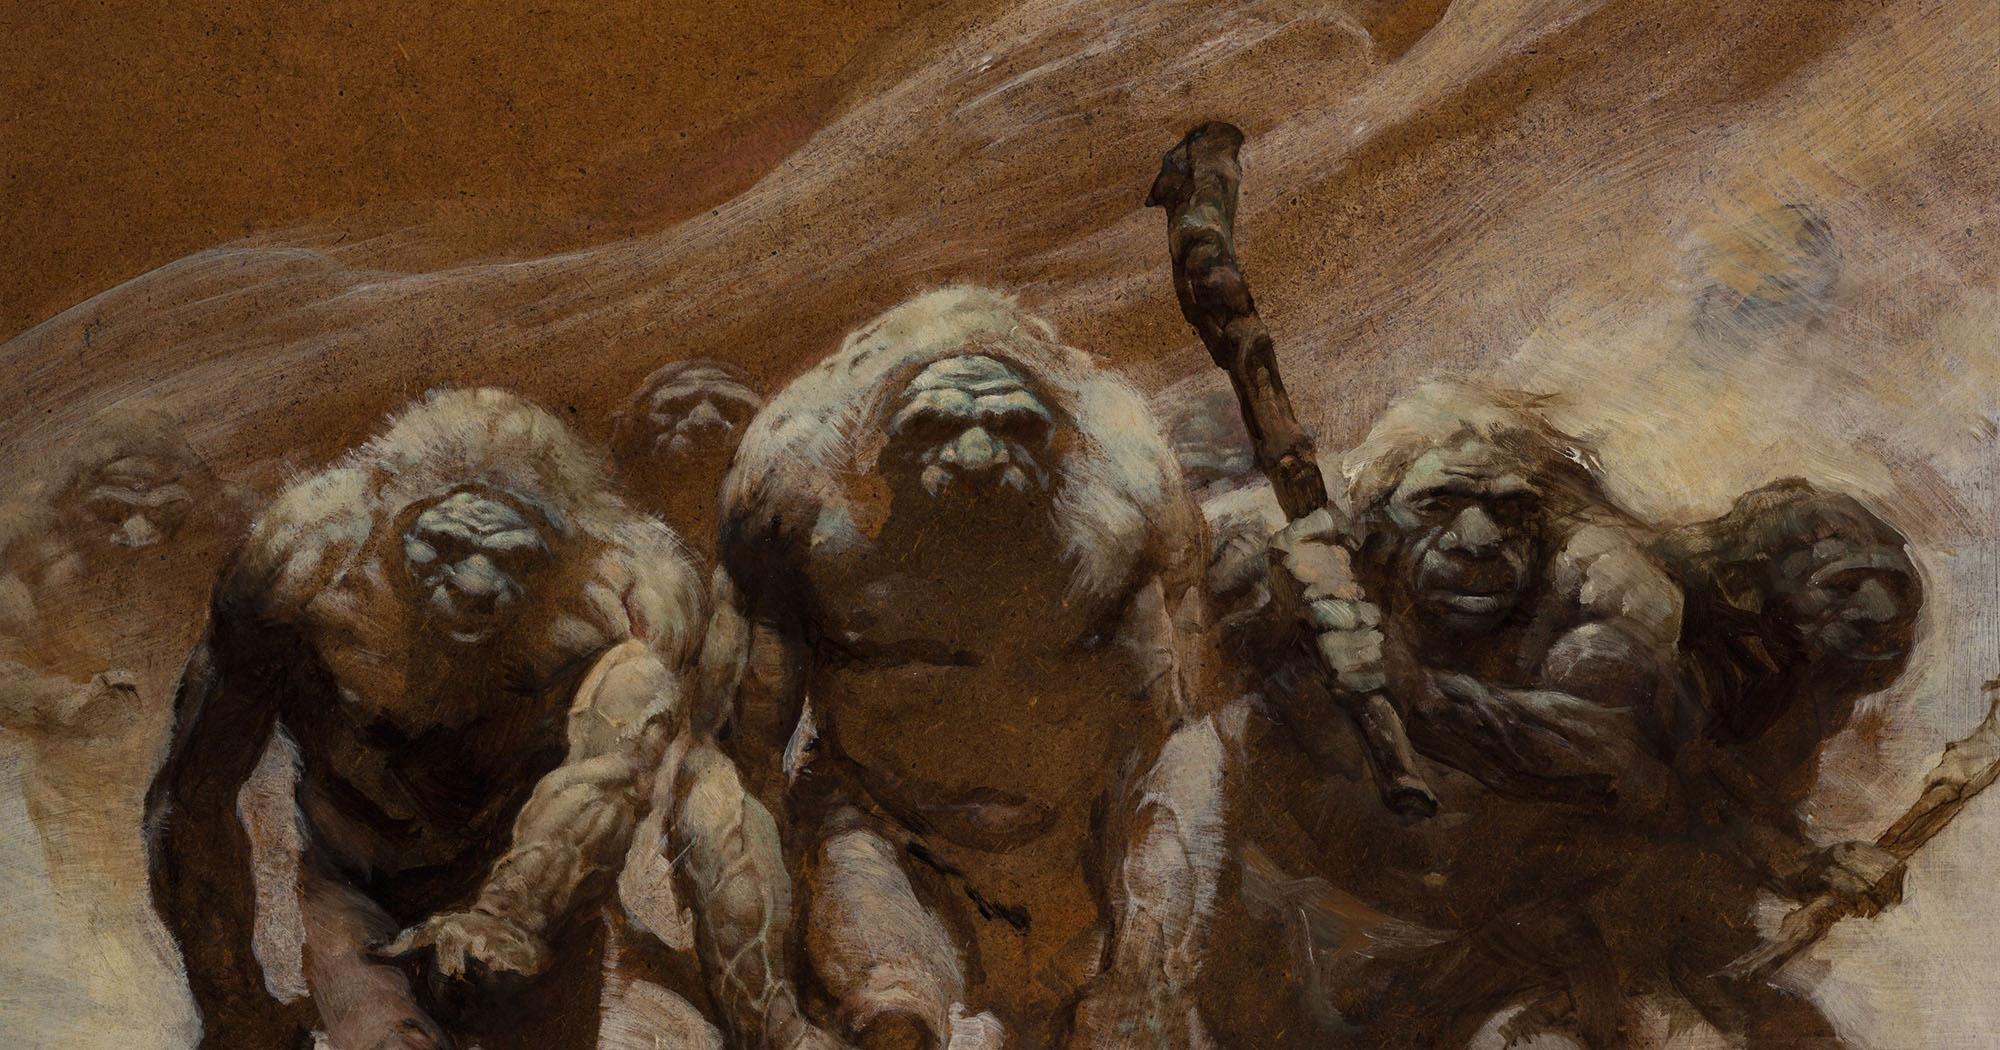 Неандертальцы. Рисунок Фрэнка Фразетты.